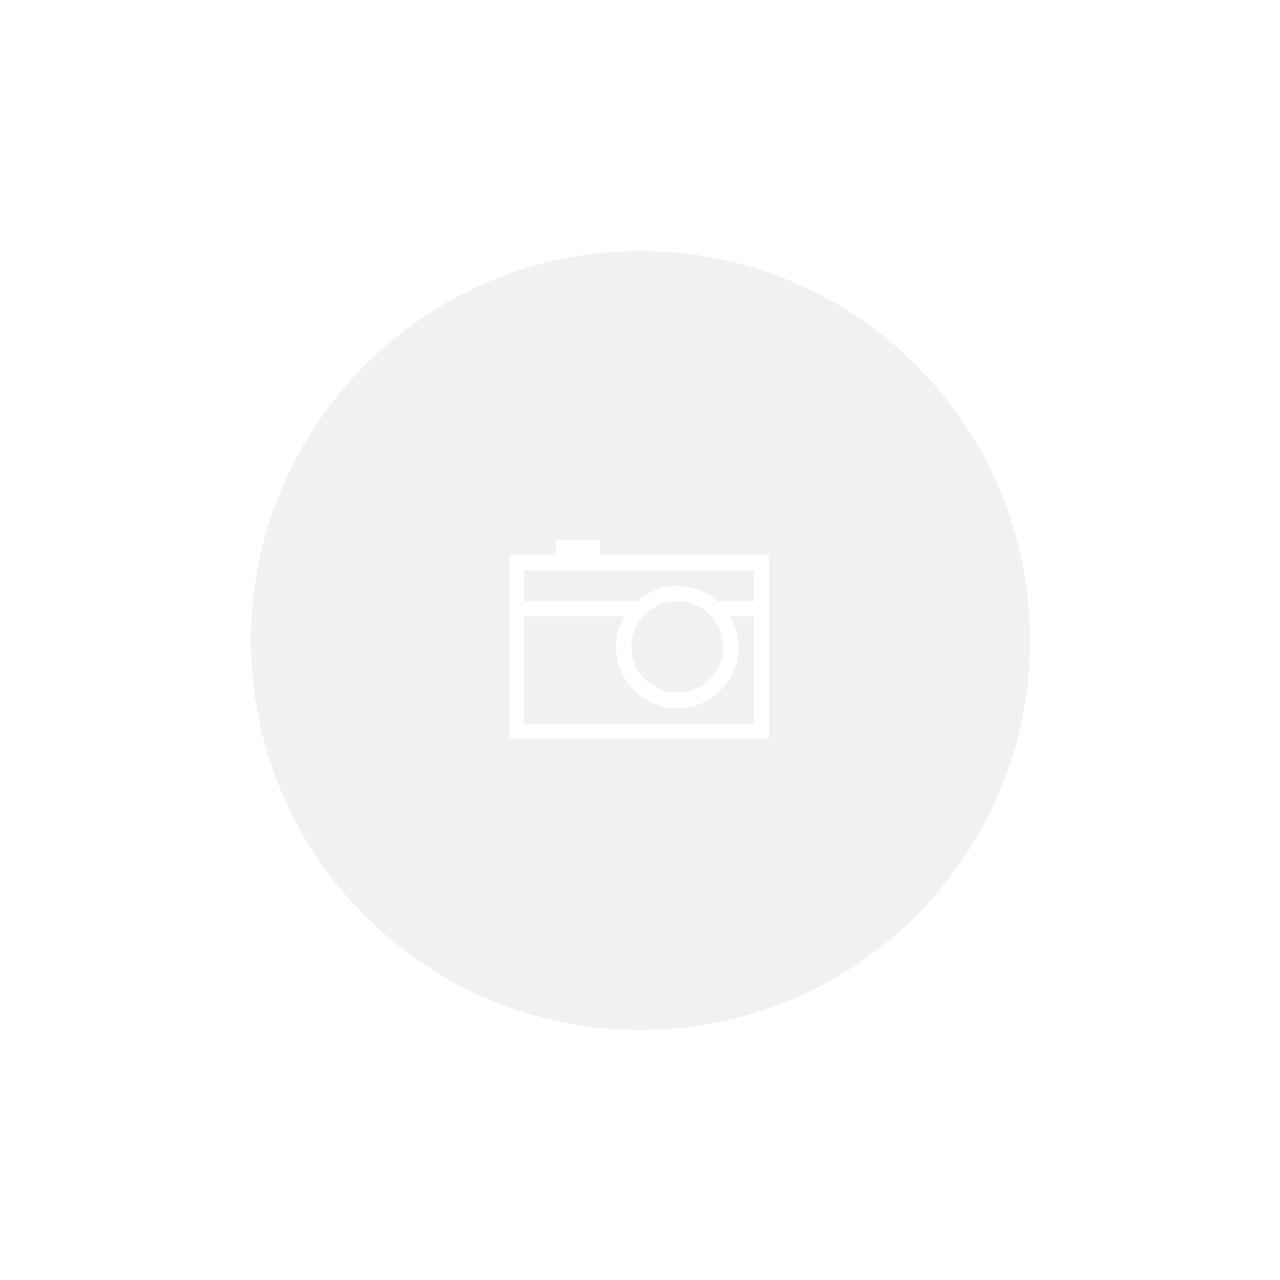 Cachepot Deco Silver 13,5x13,5x12,8cm Bencafil